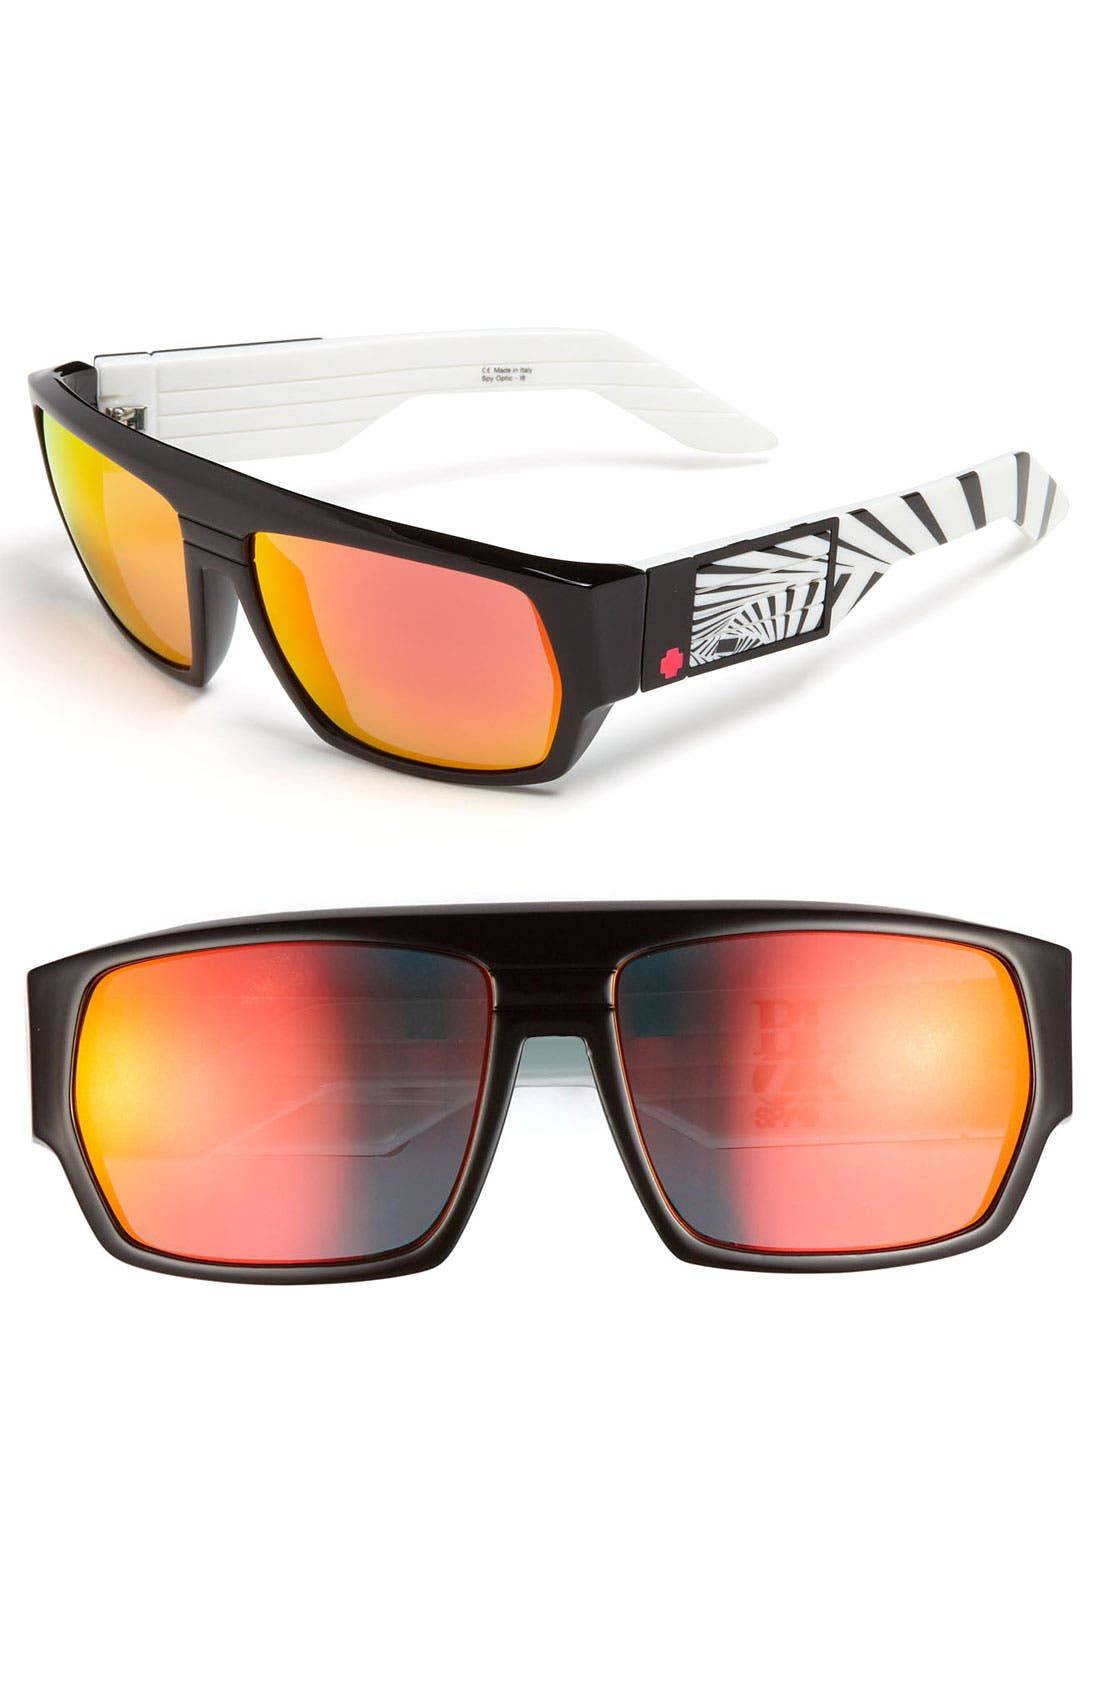 Alternate Image 1 Selected - SPY Optic 'Blok' Sunglasses